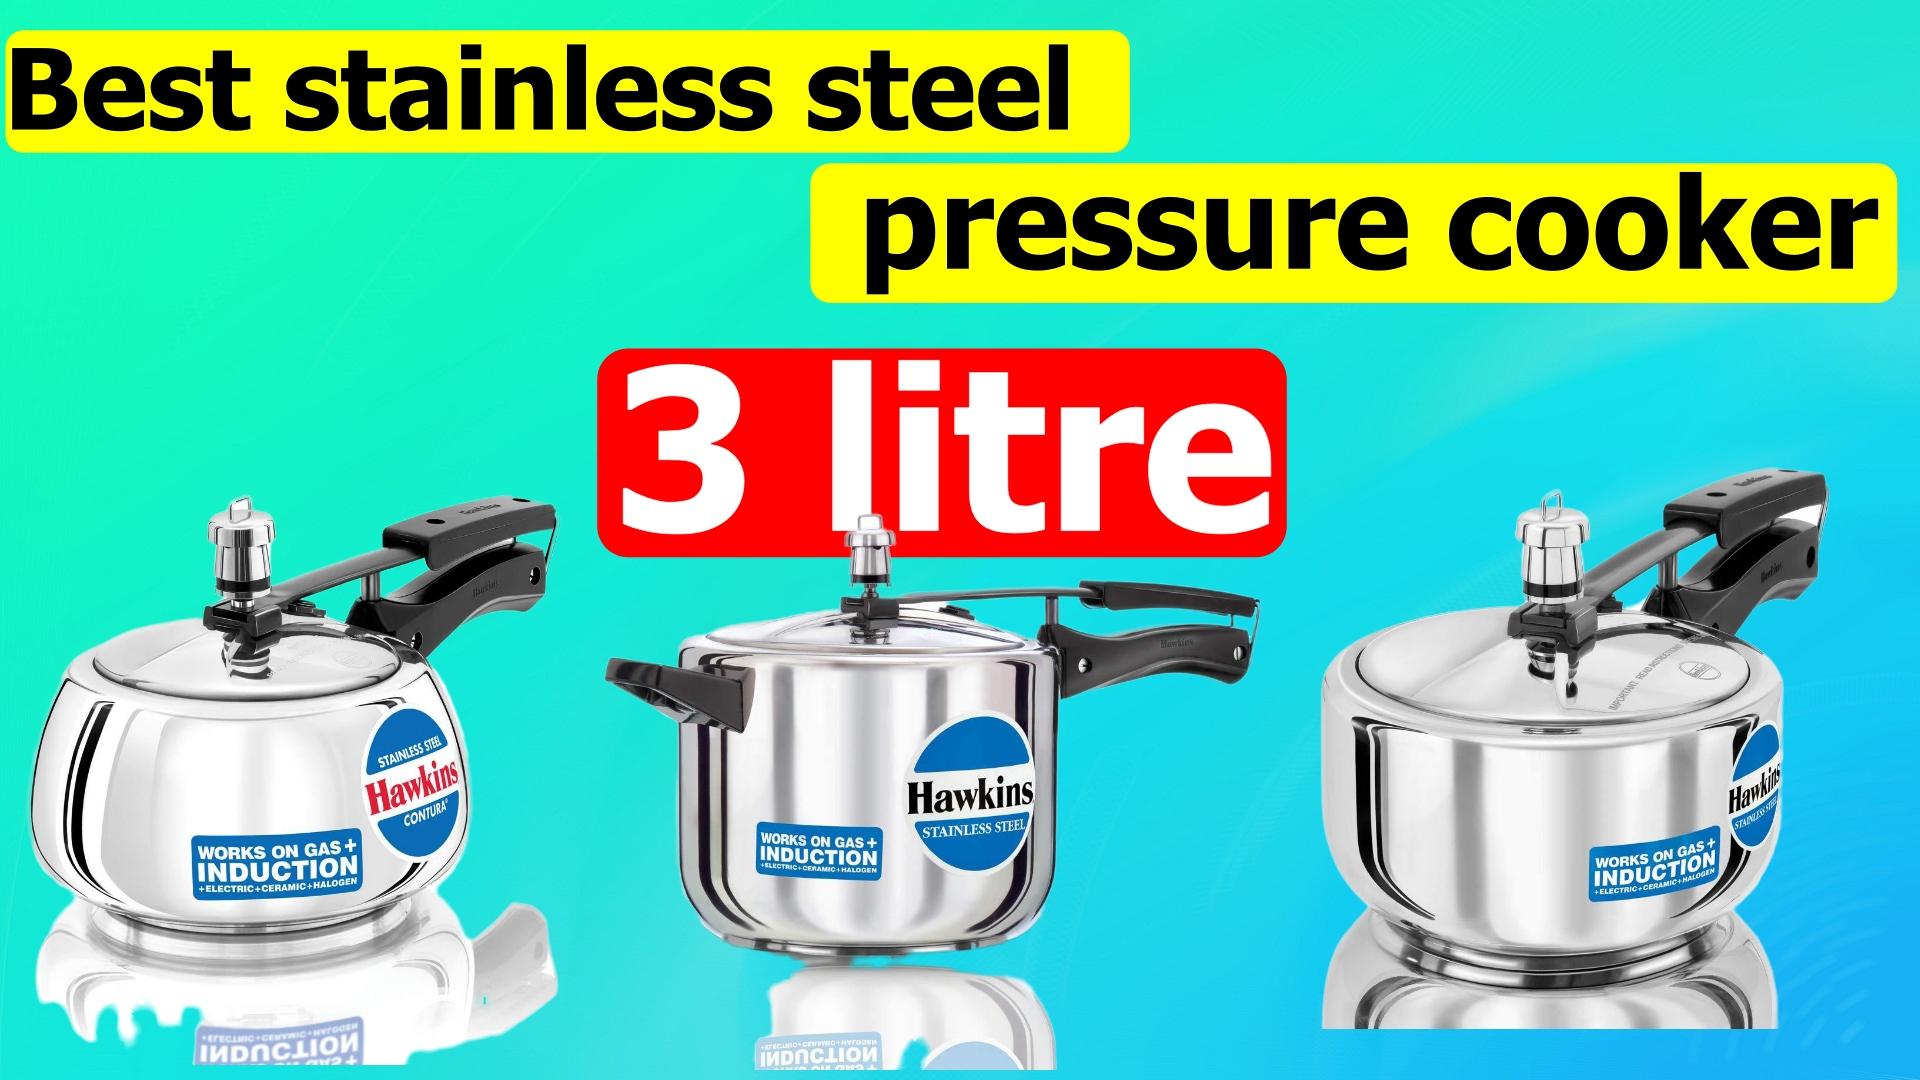 Best stainless steel pressure cooker 3 litre